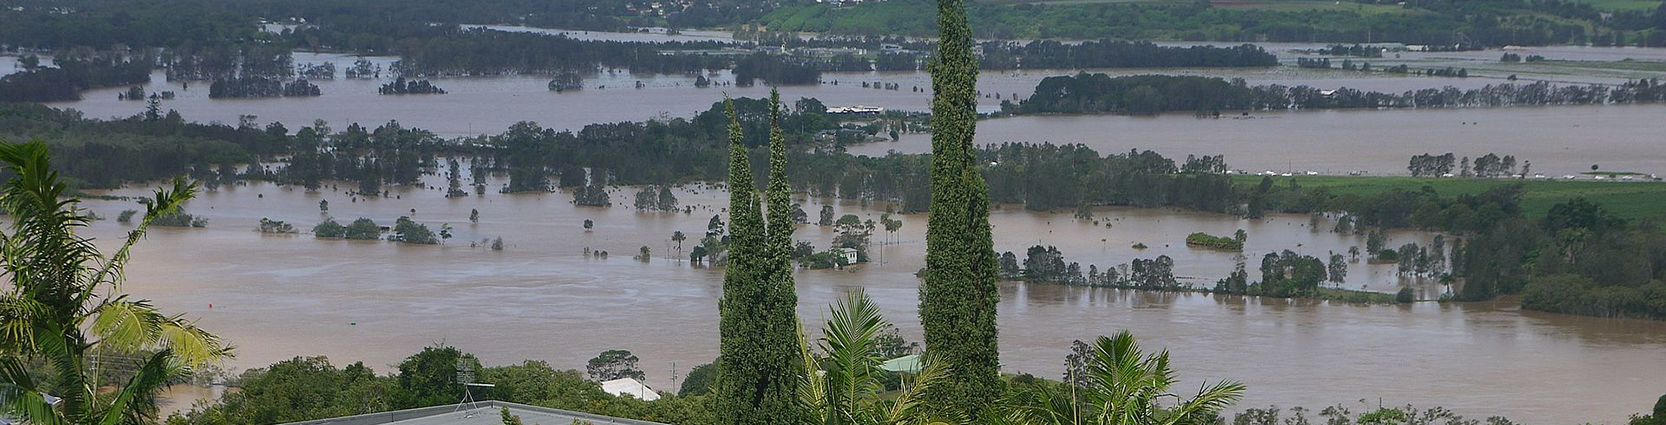 Tweed_River_Floods_from_Terranora.jpg